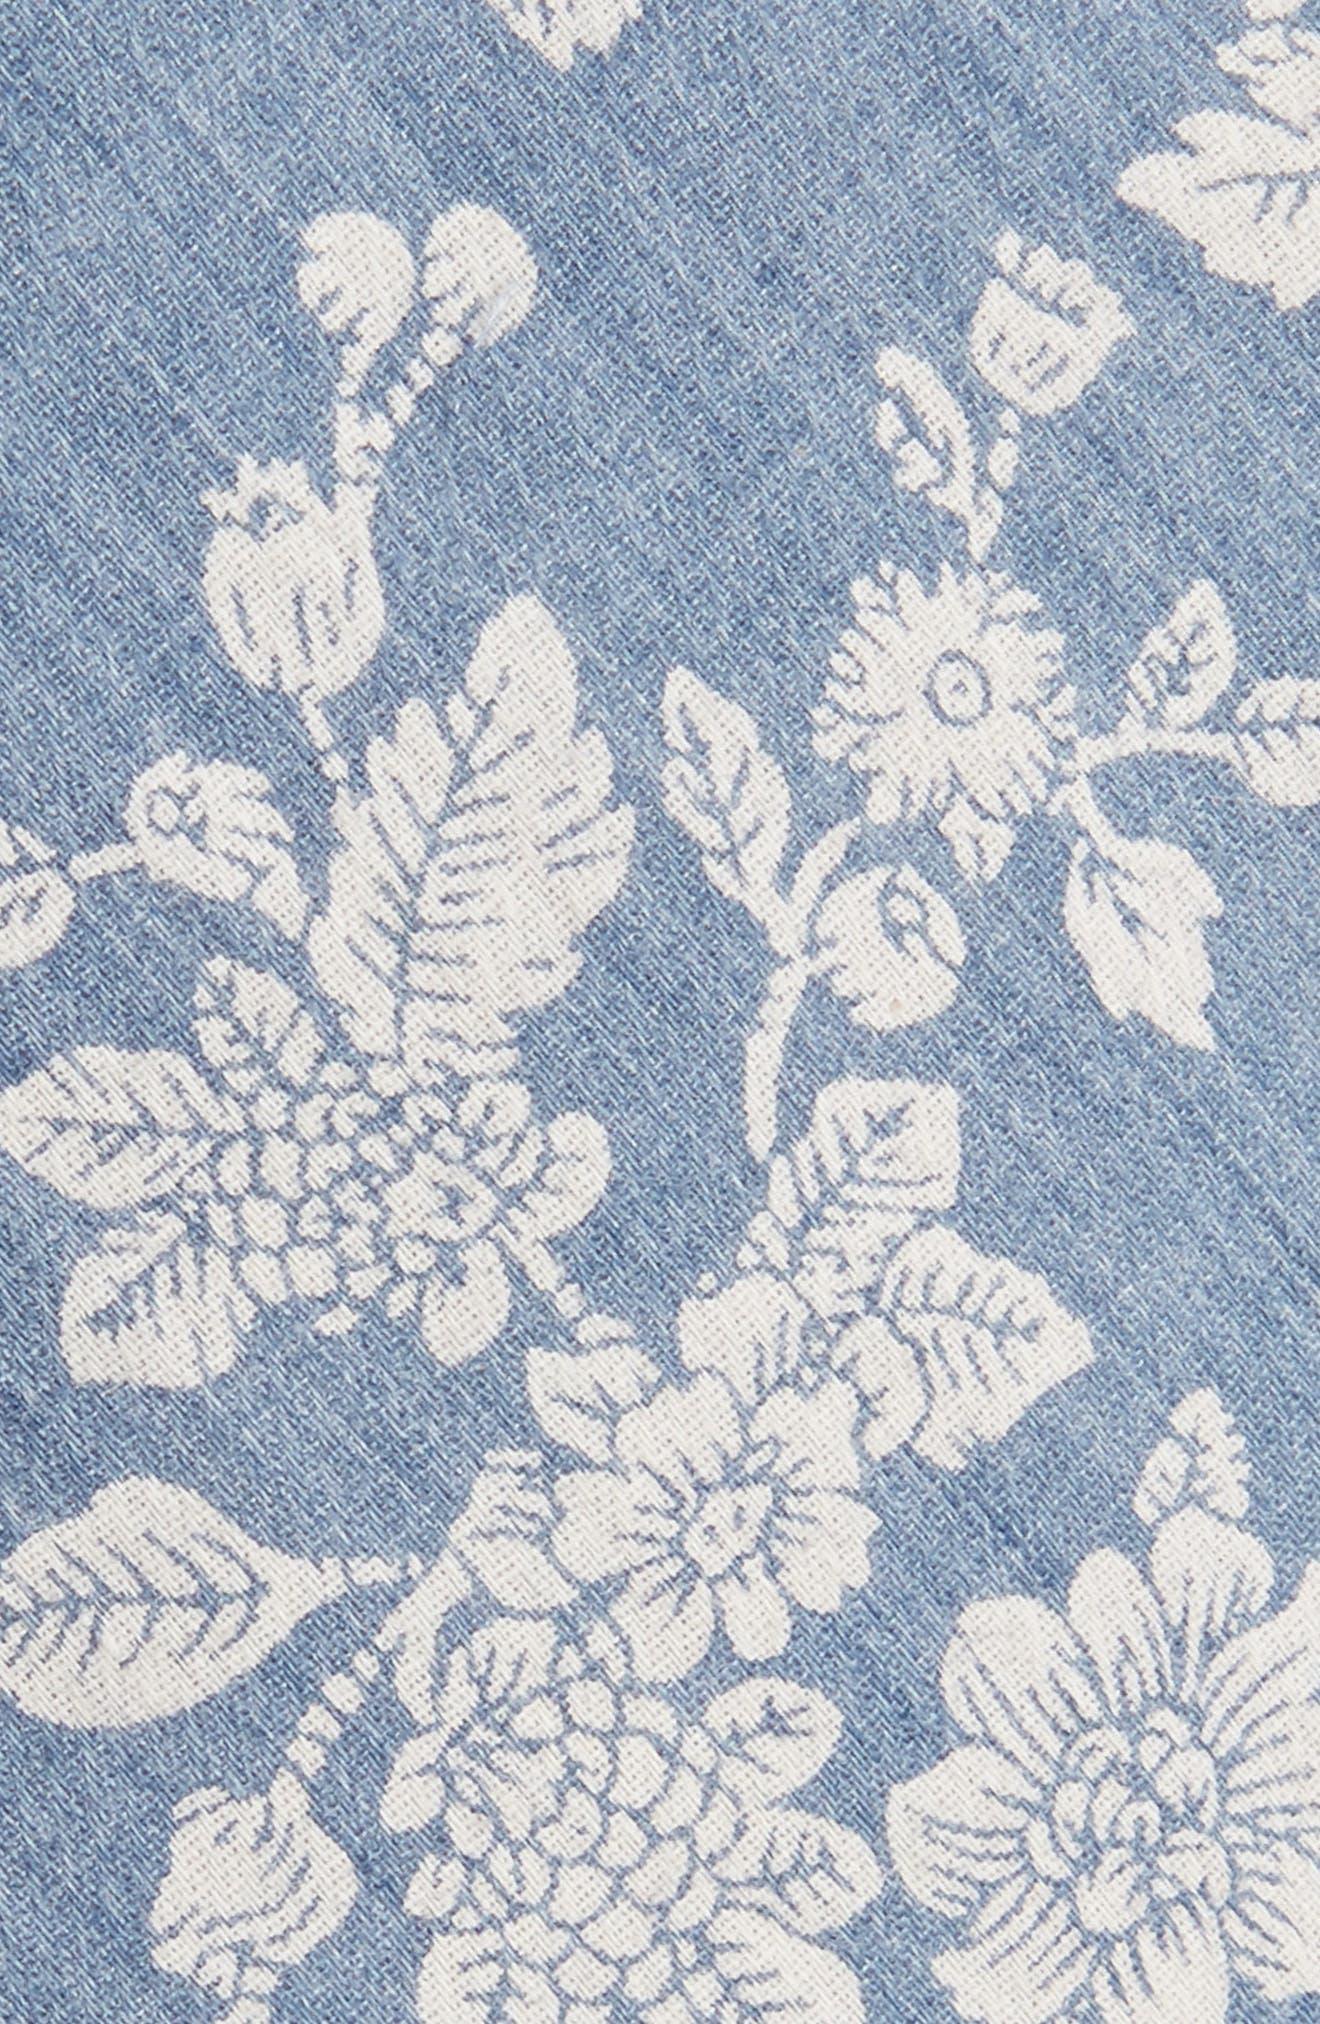 Floral Cotton Skinny Tie,                             Alternate thumbnail 2, color,                             Blue1